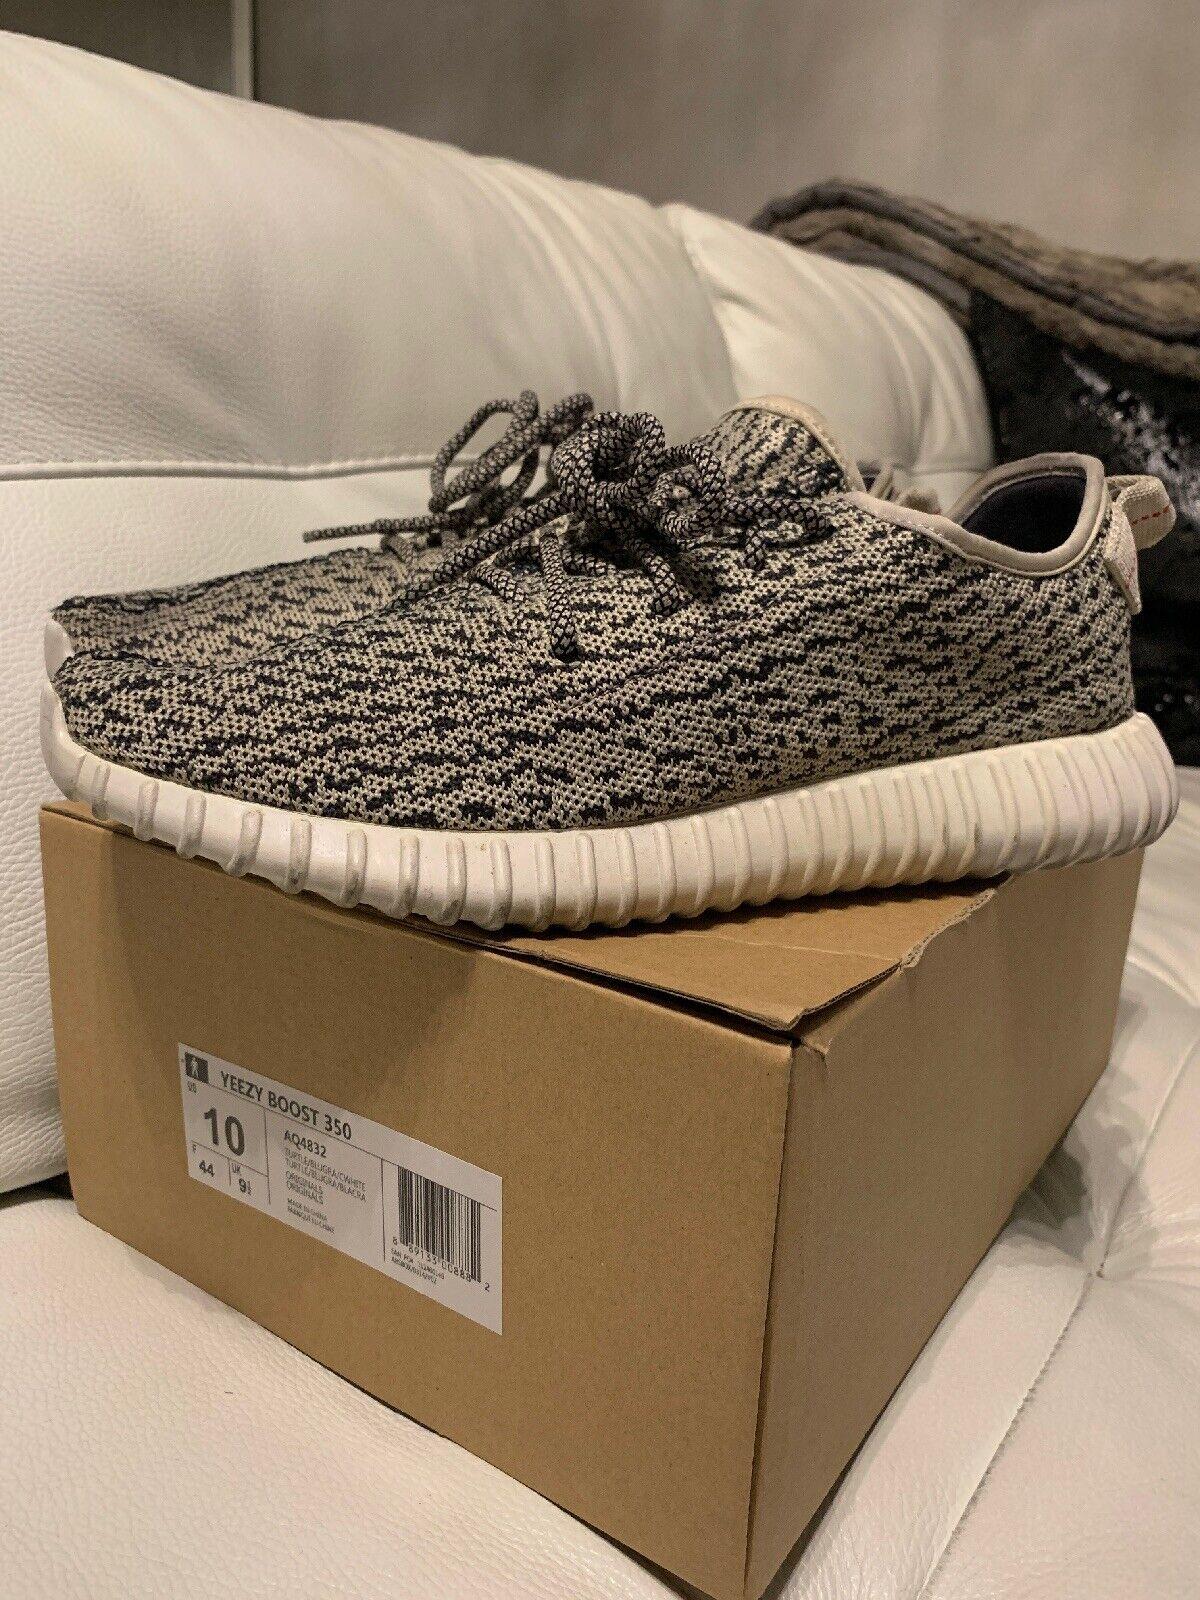 adidas Yeezy Boost 350 Turtle Dove Size 10